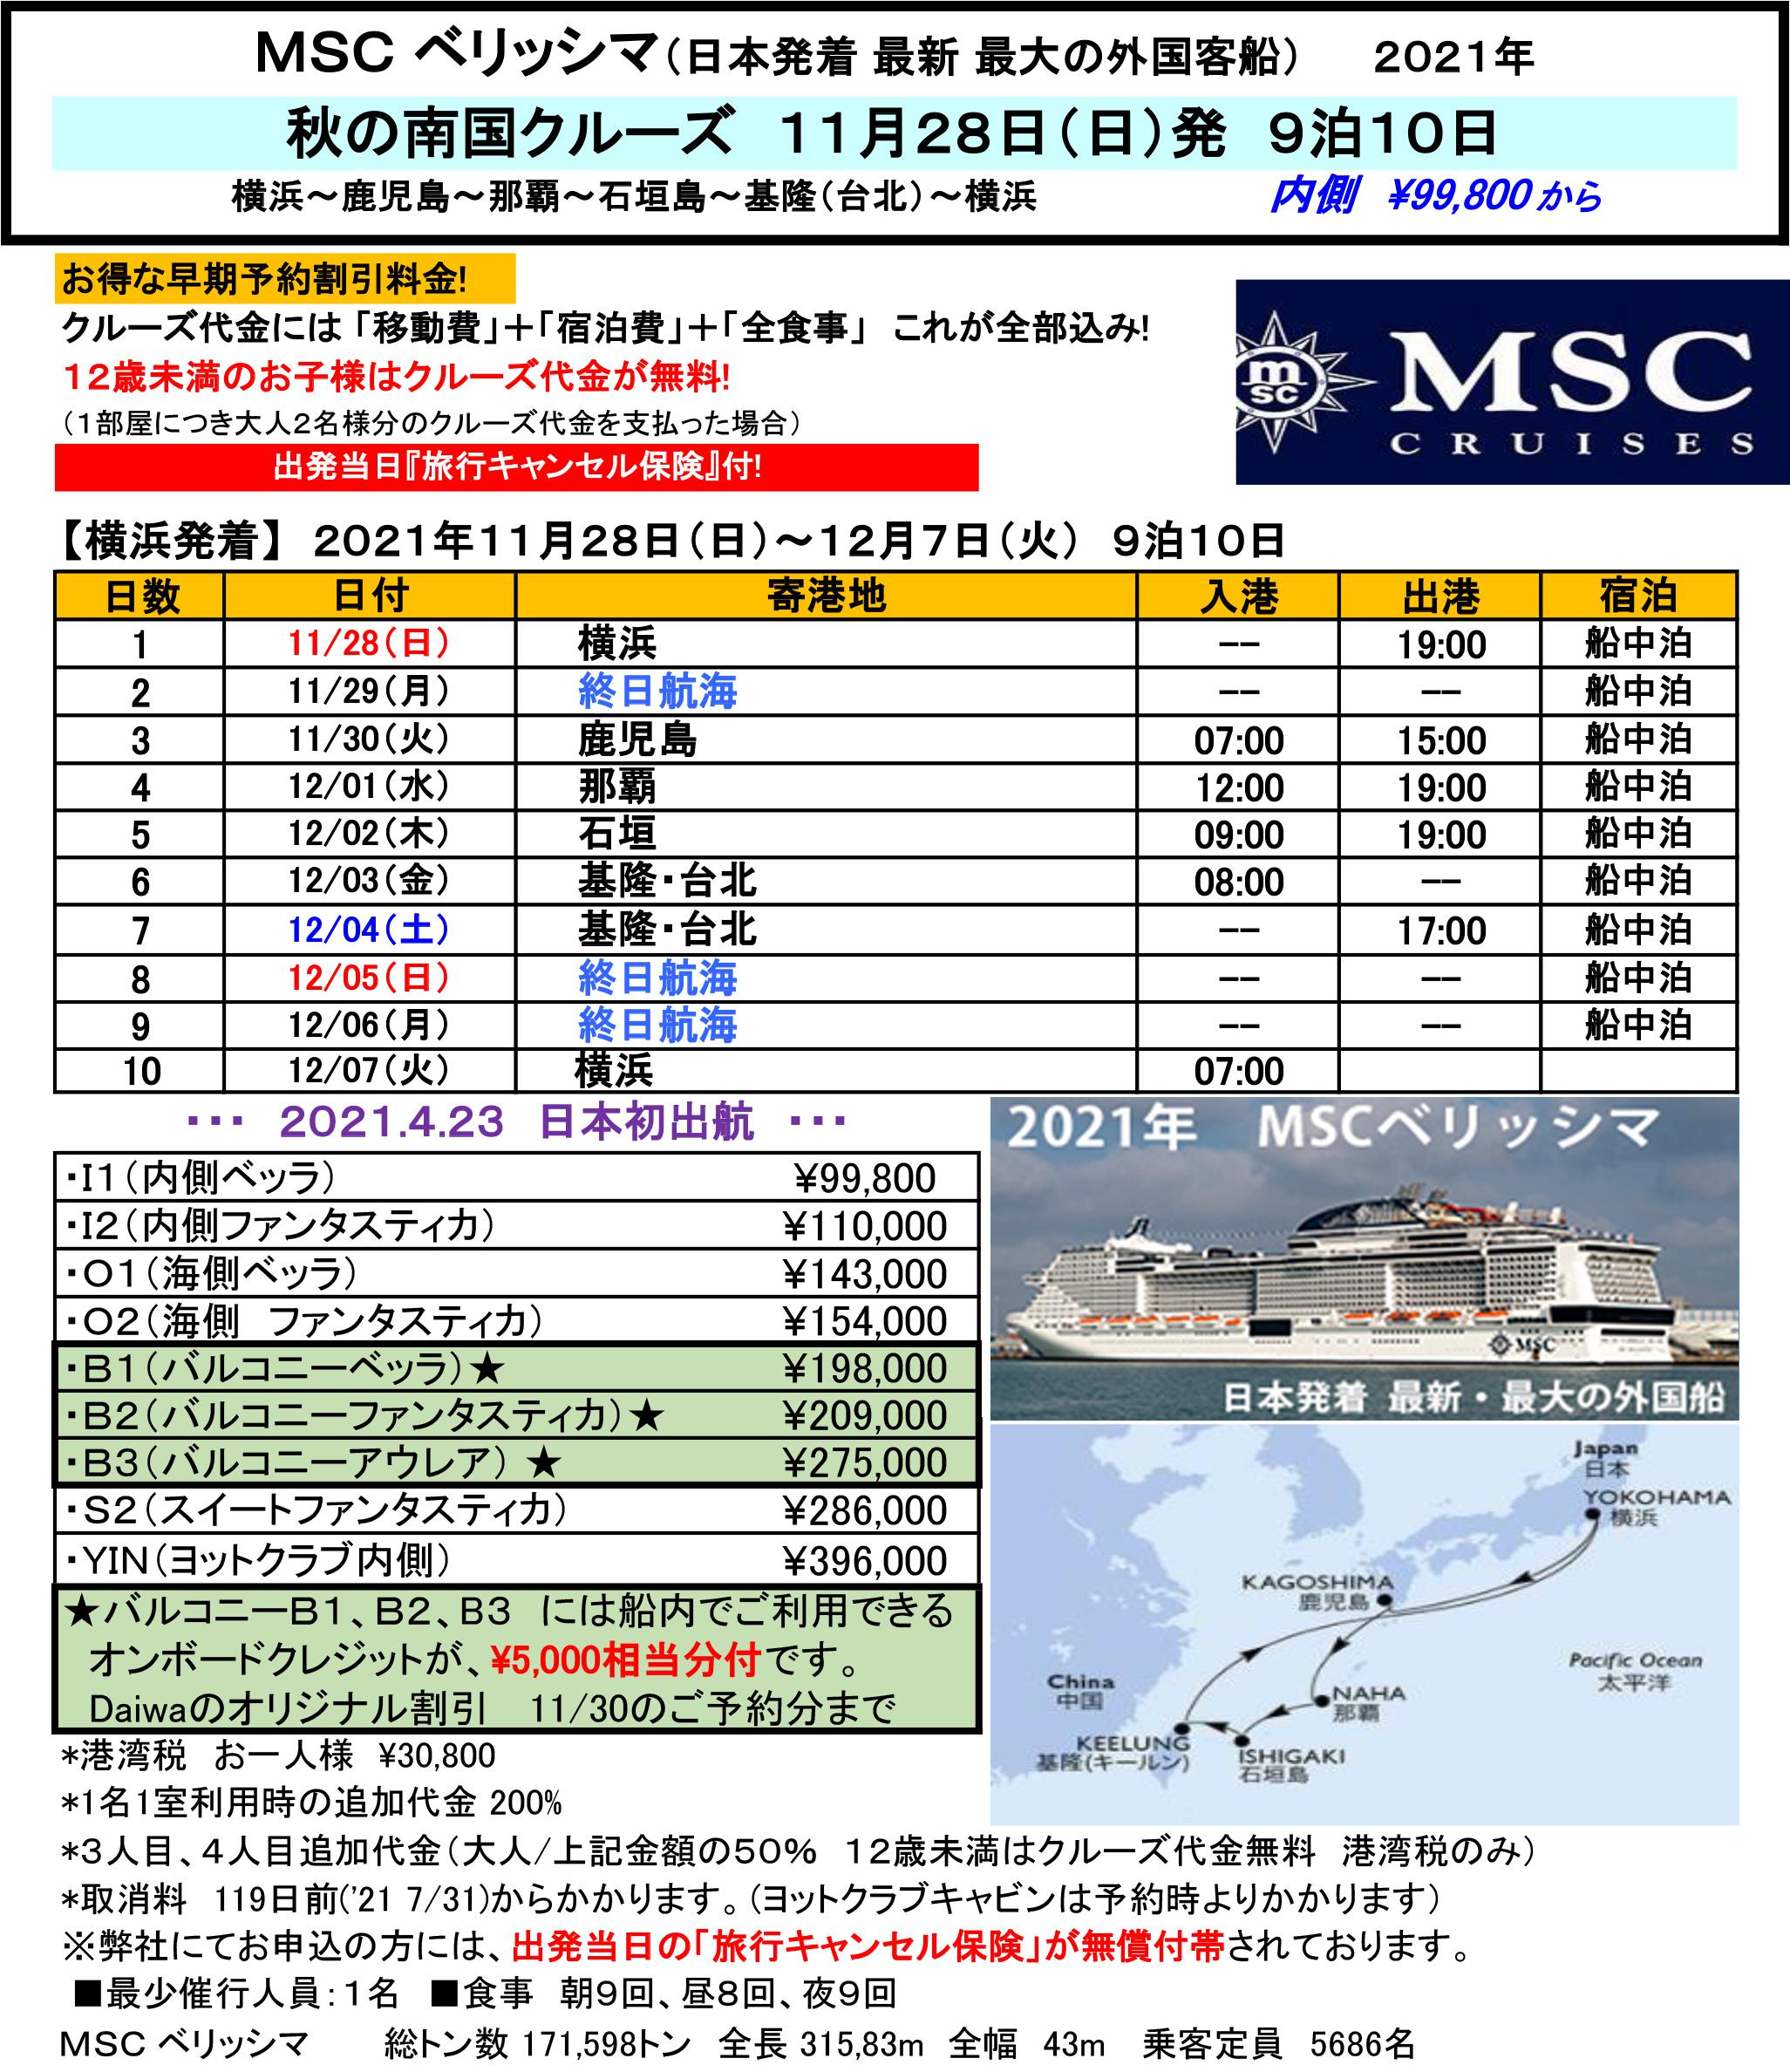 MSCベリッシマ 11月28日発9泊10日